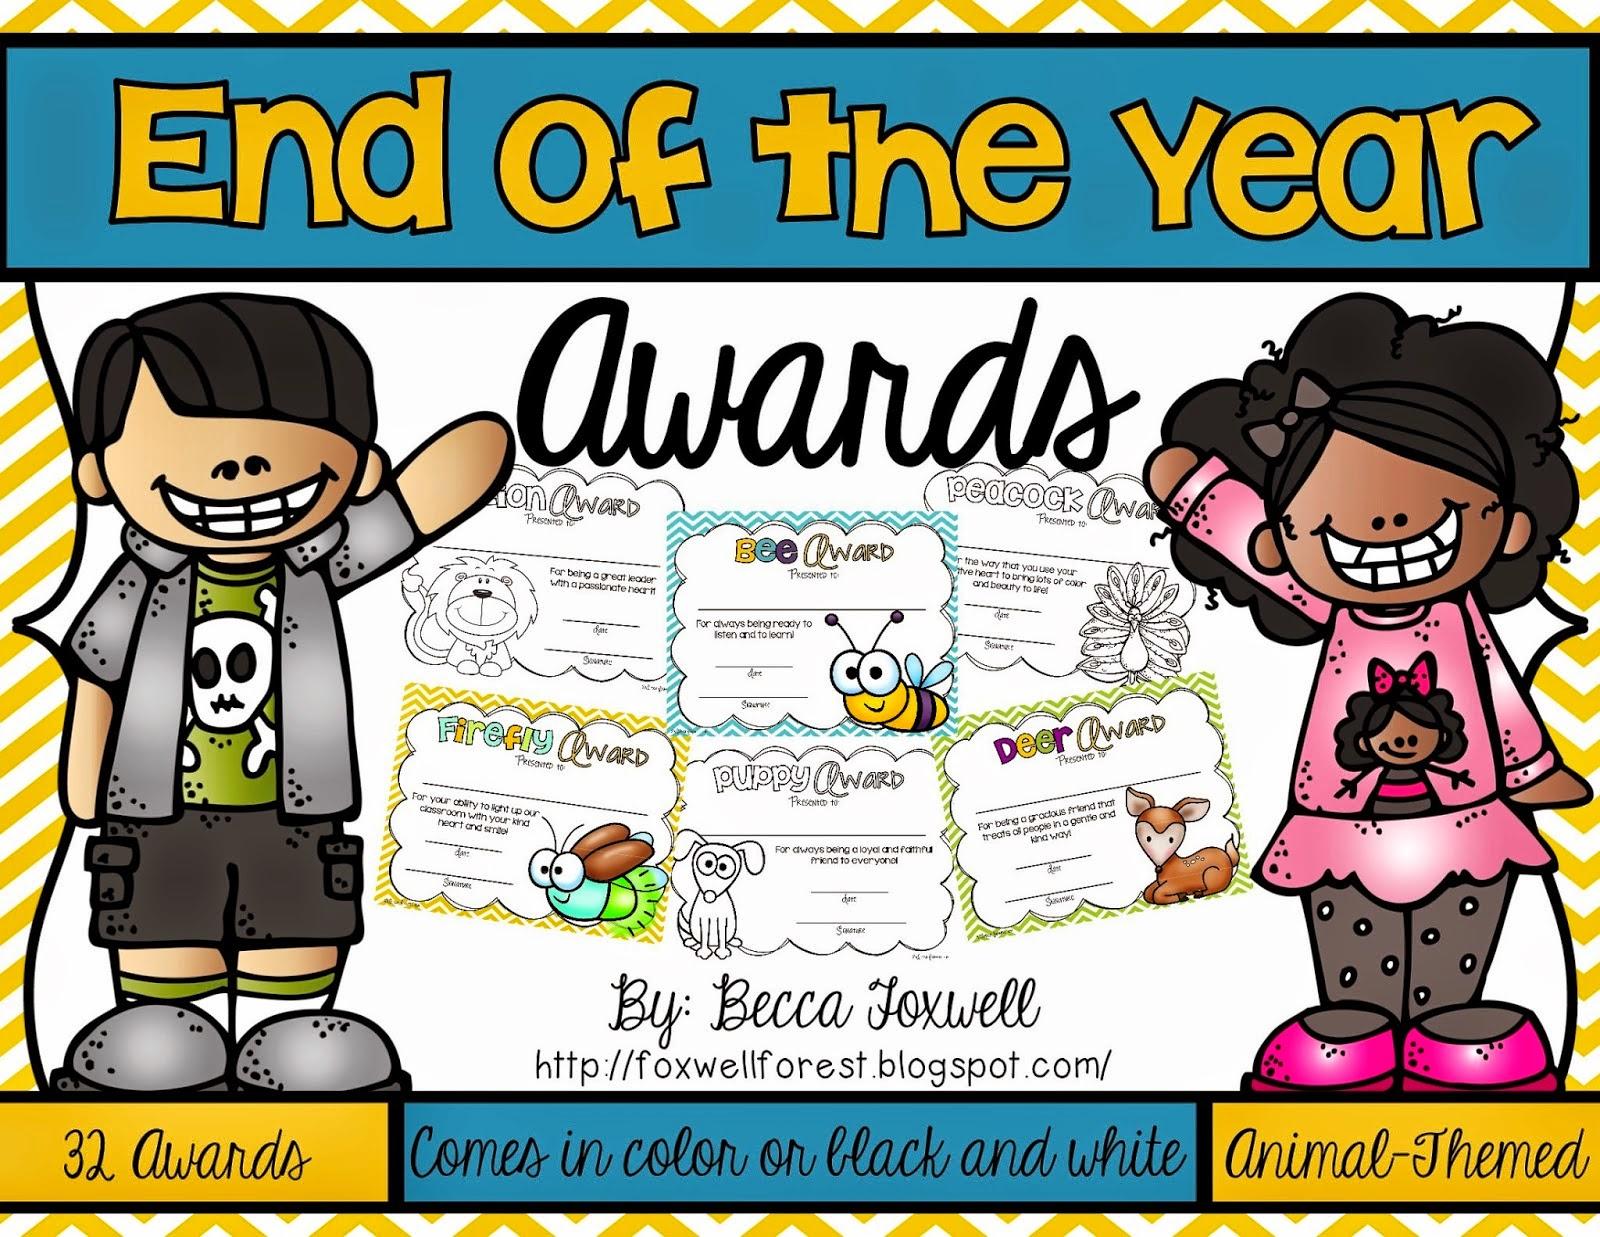 http://www.teacherspayteachers.com/Product/End-of-the-Year-Awards-1248295